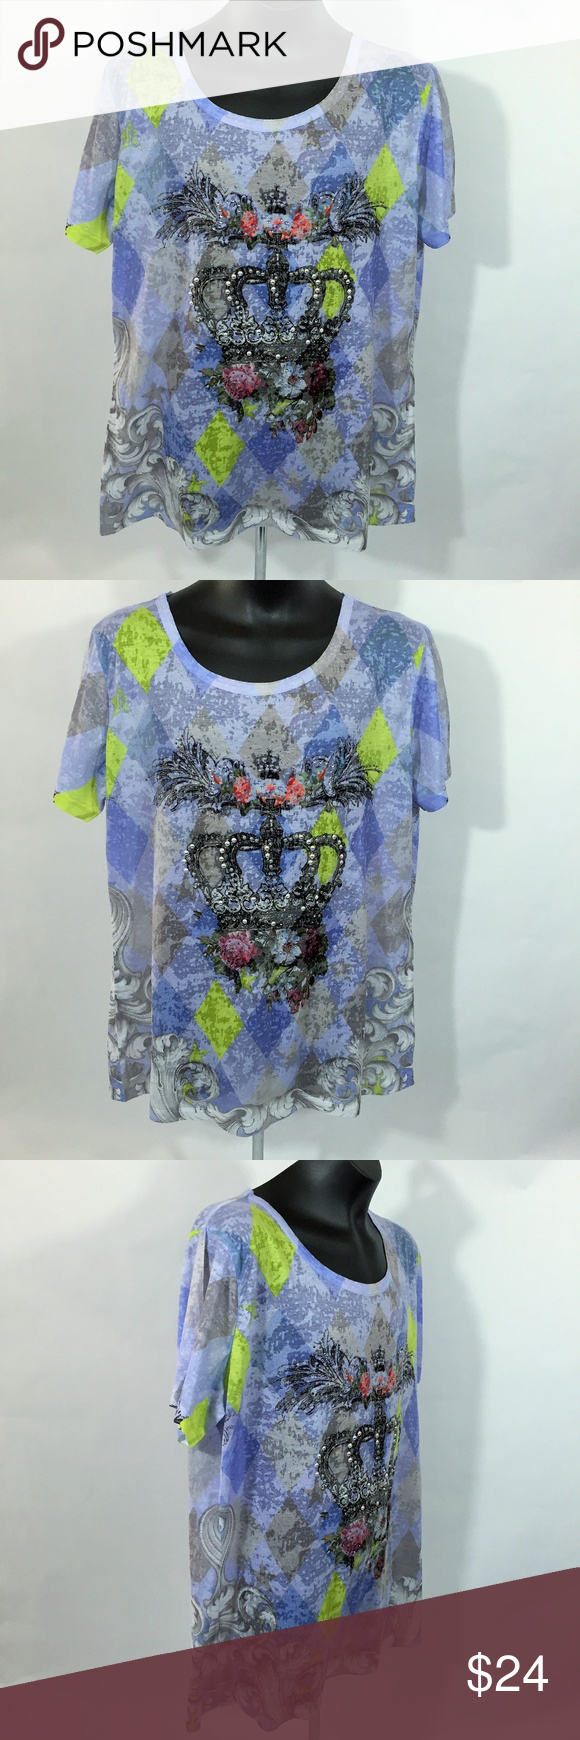 e7c0e38214f Magic e Collection Women s Short Sleeve Blouse Magic e Collection Women s  blouse soft fabric